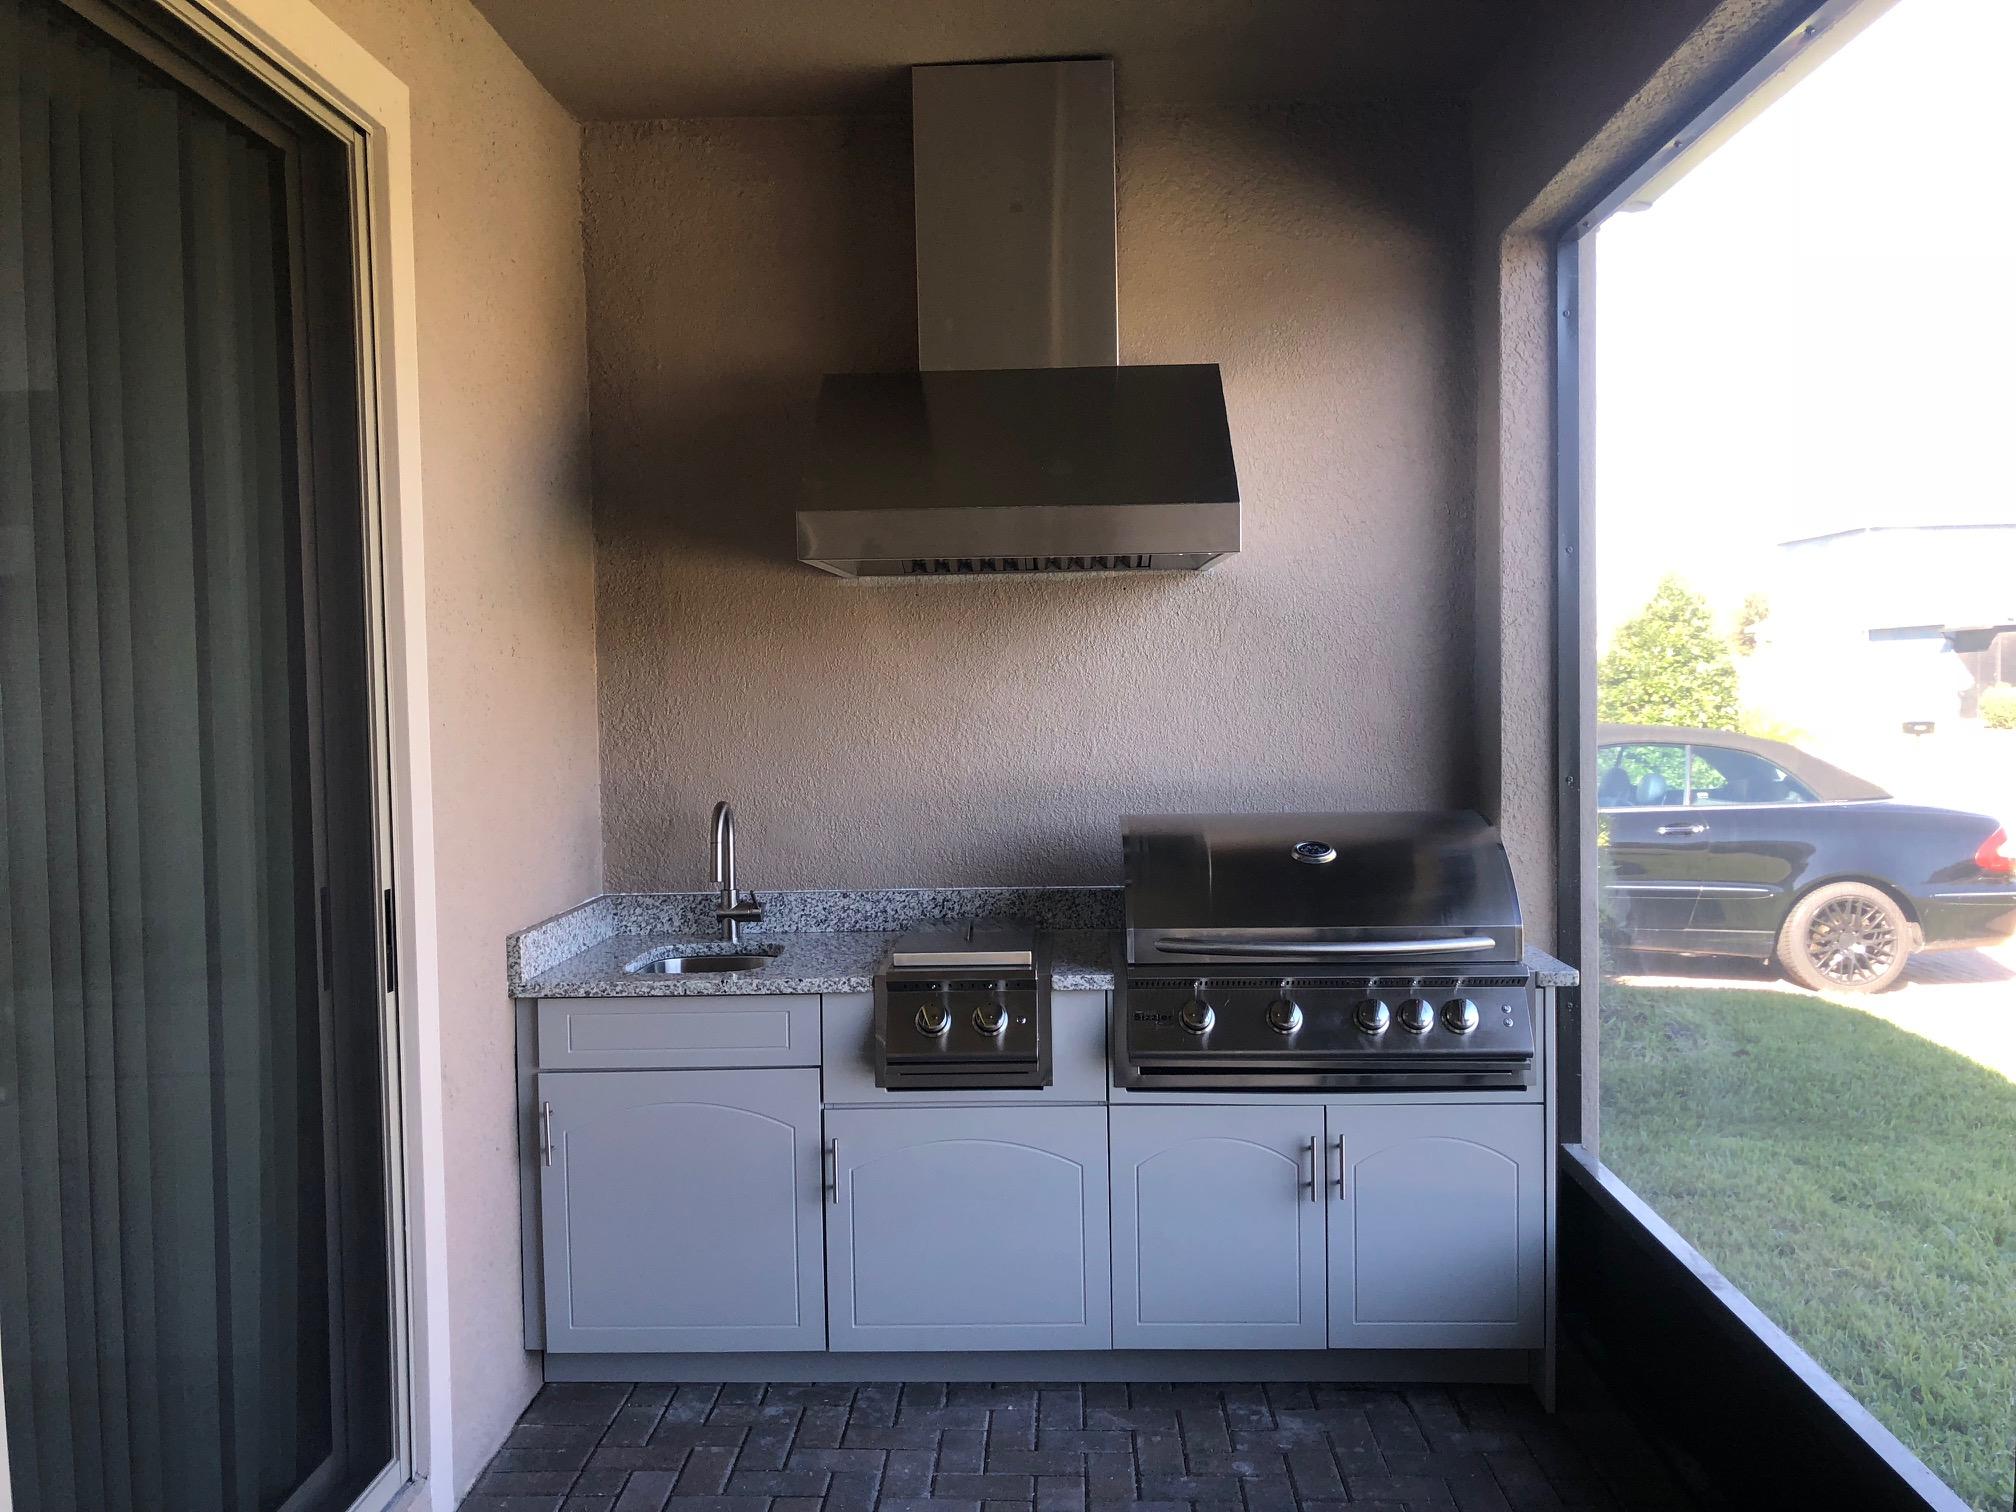 Outdoor Kitchen with Range Hood